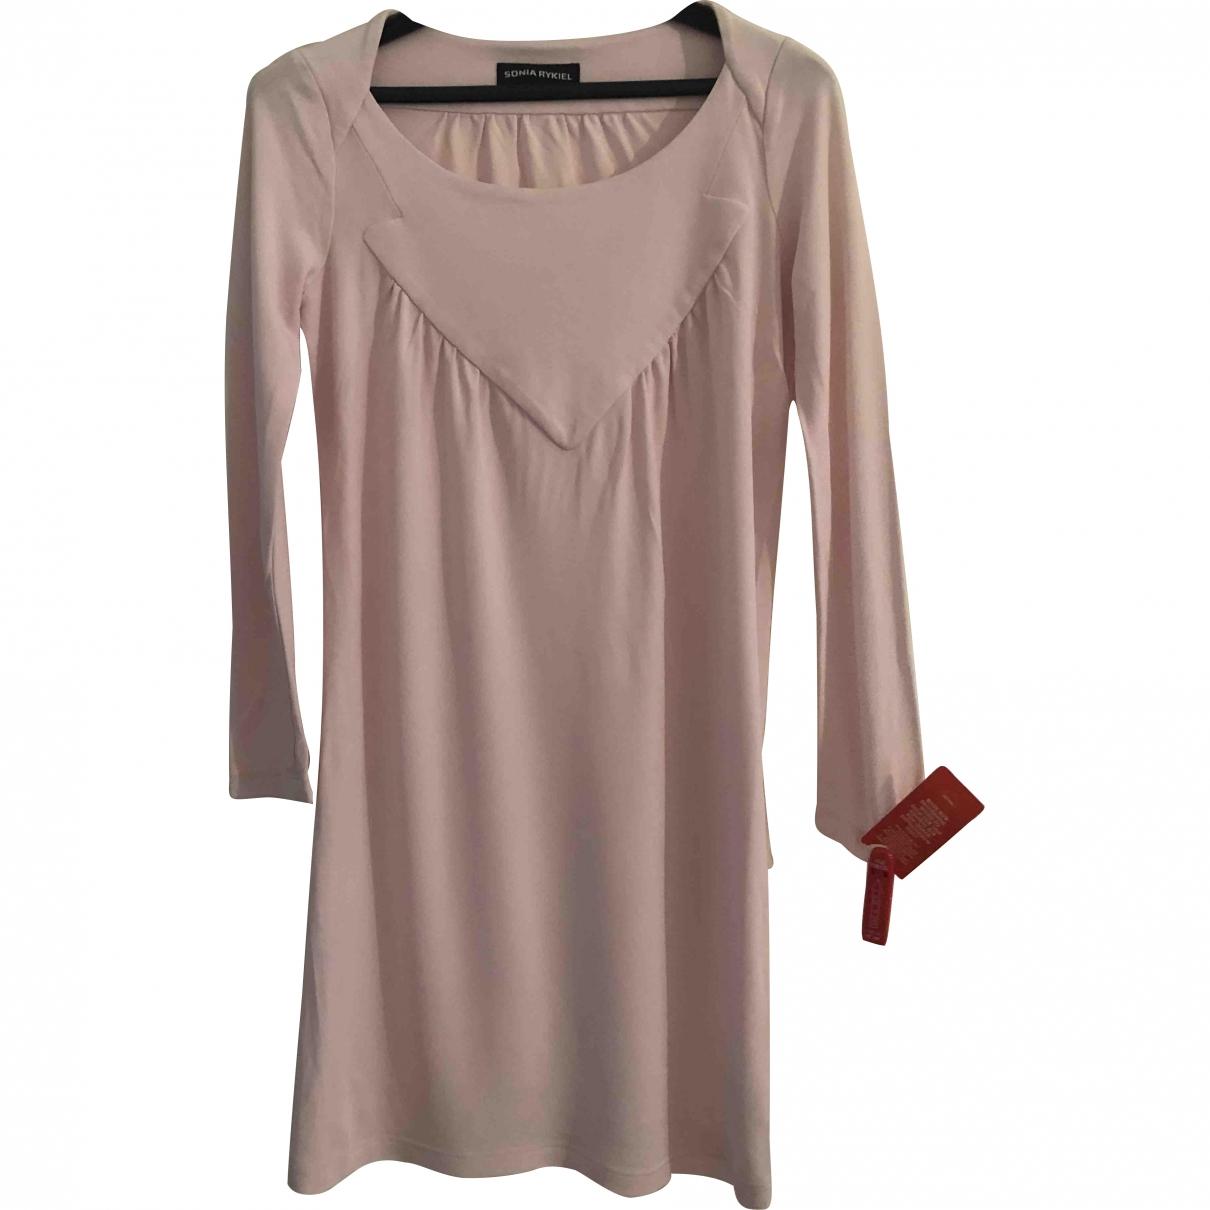 Sonia Rykiel \N Pink dress for Women XS International